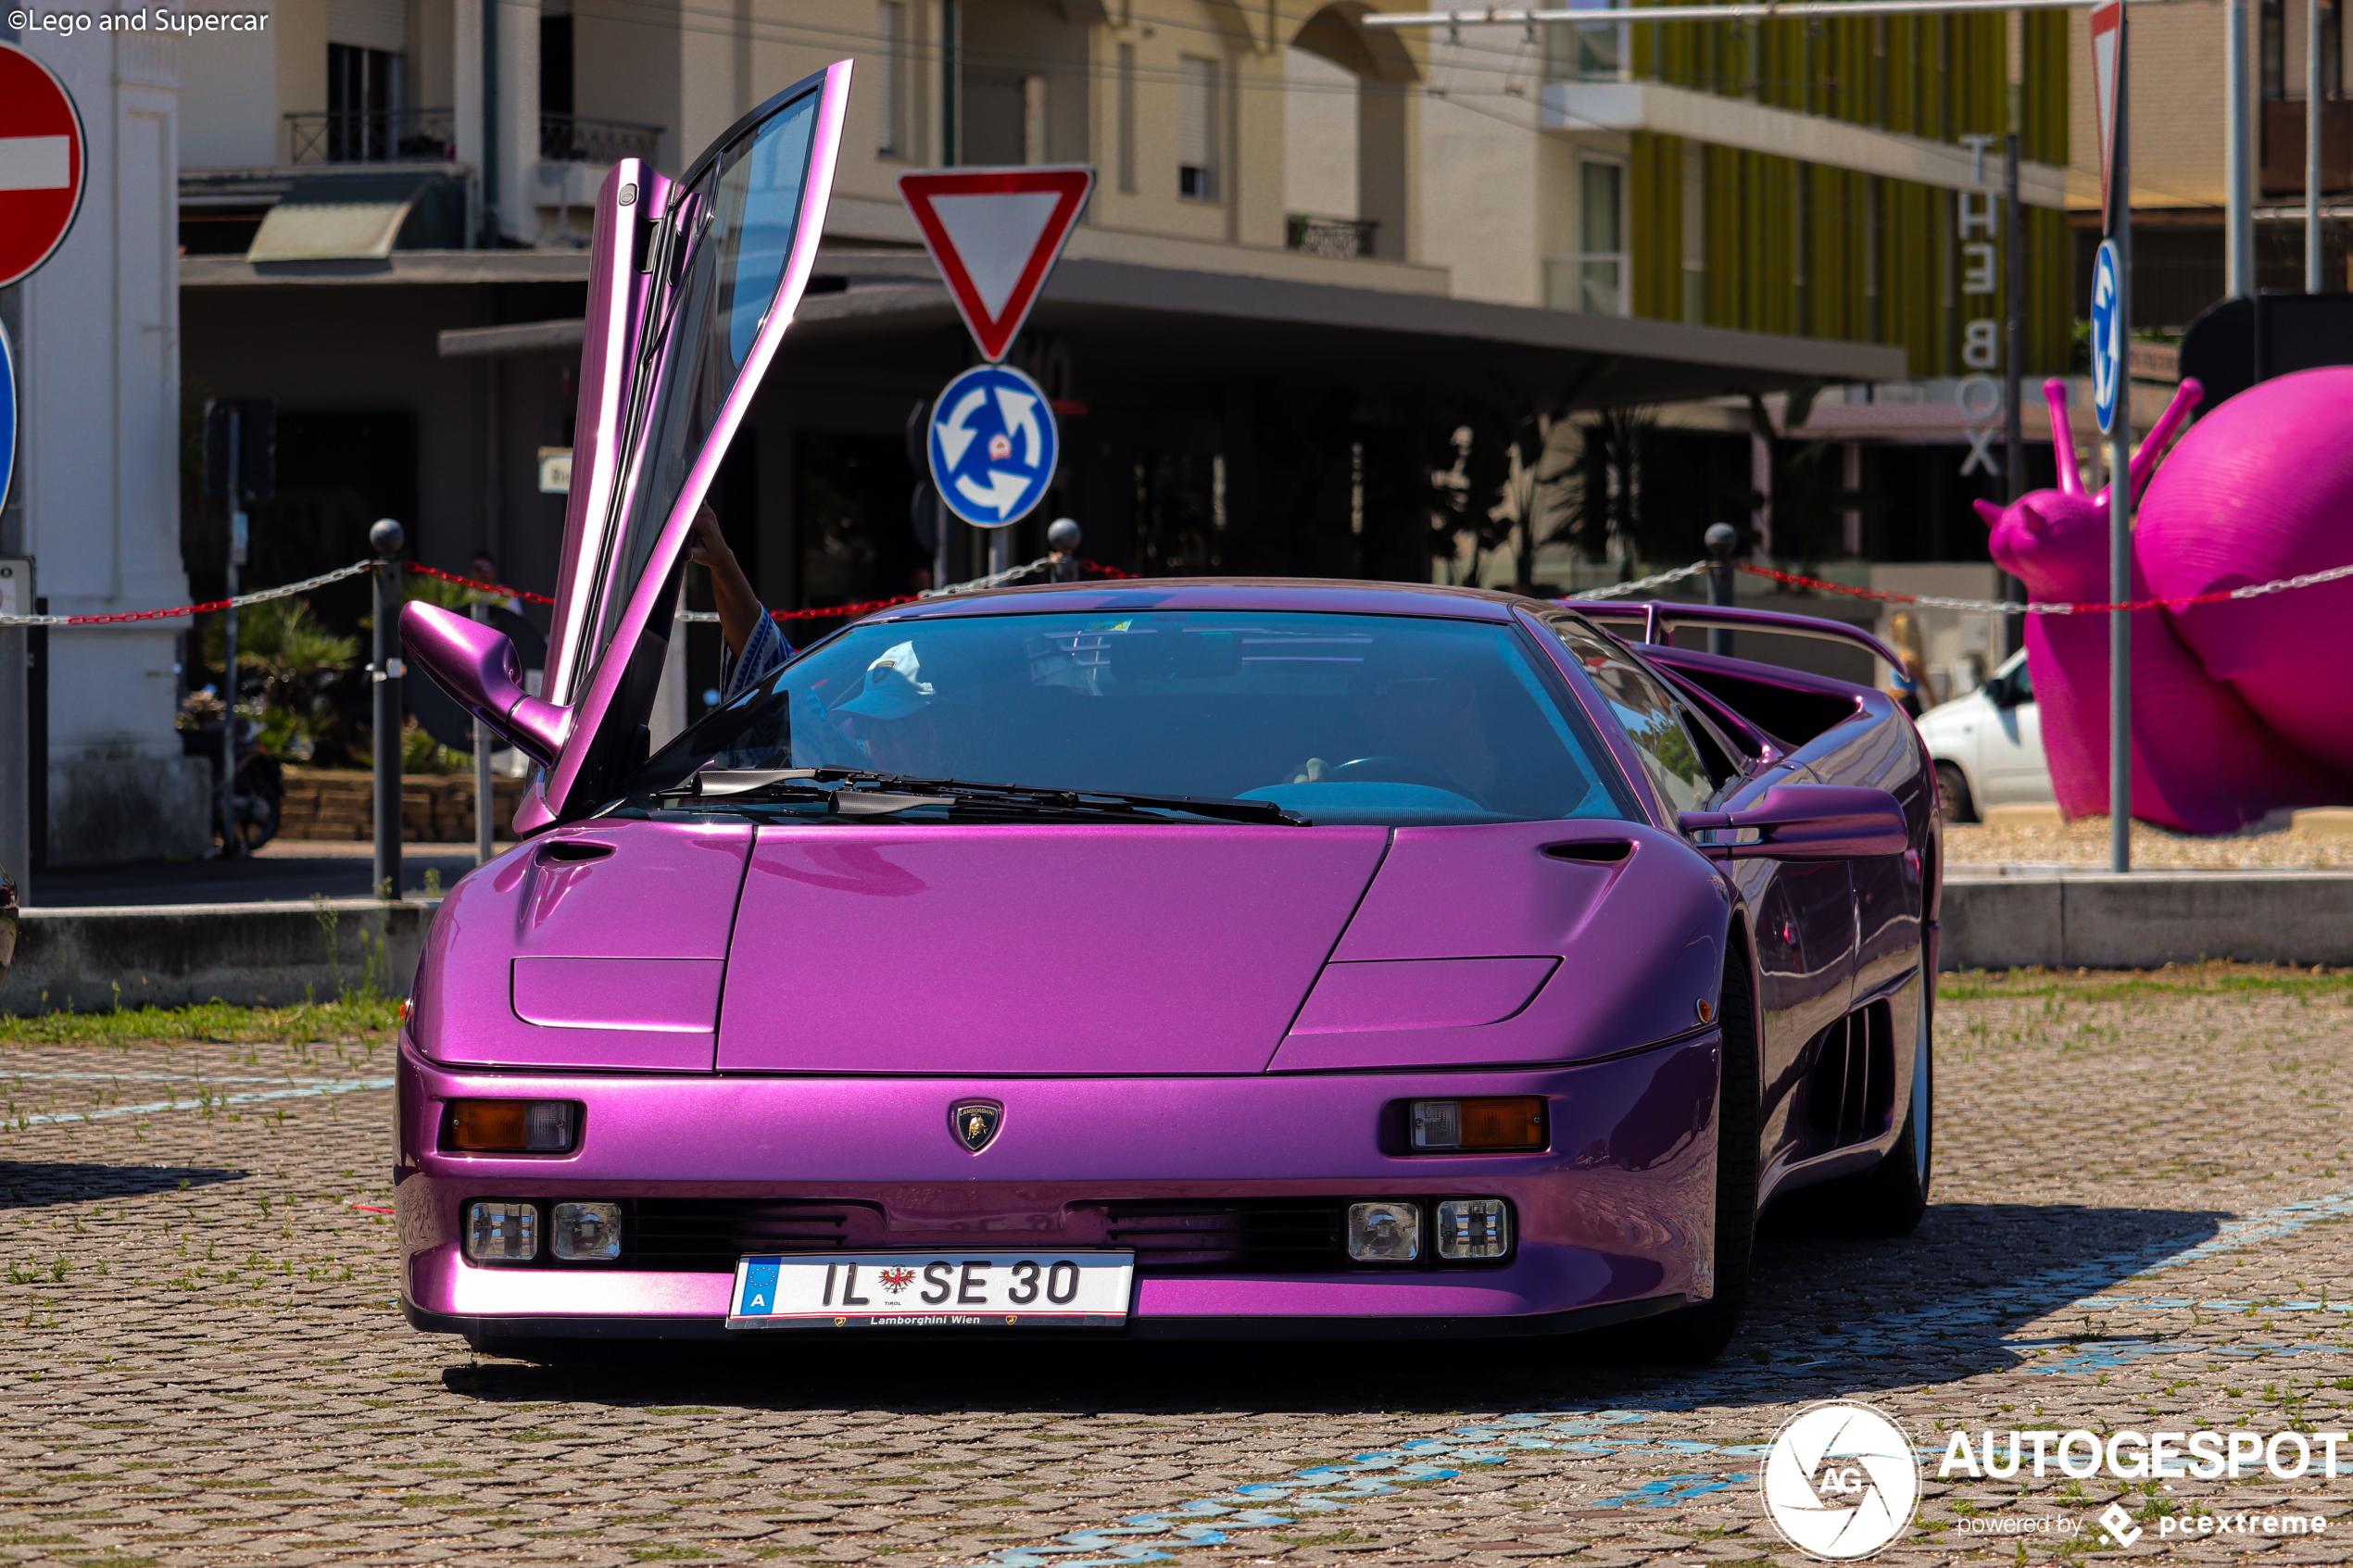 Lamborghini Diablo SE30 is een echte droomauto